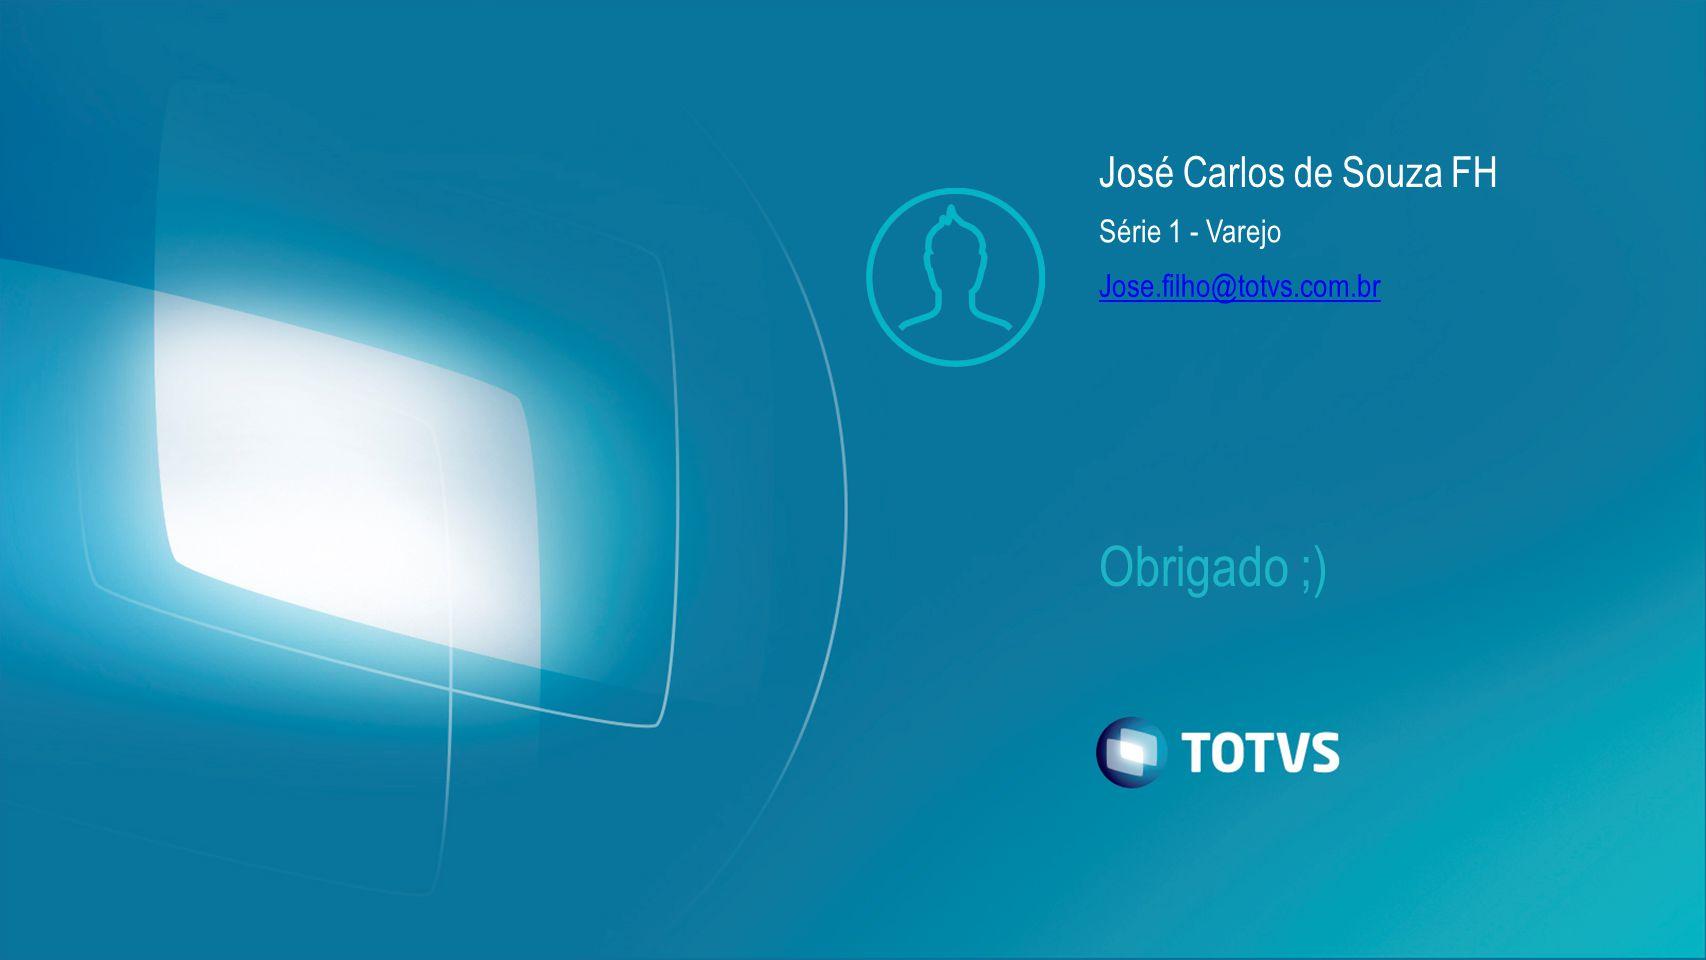 José Carlos de Souza FH Série 1 - Varejo Jose.filho@totvs.com.br